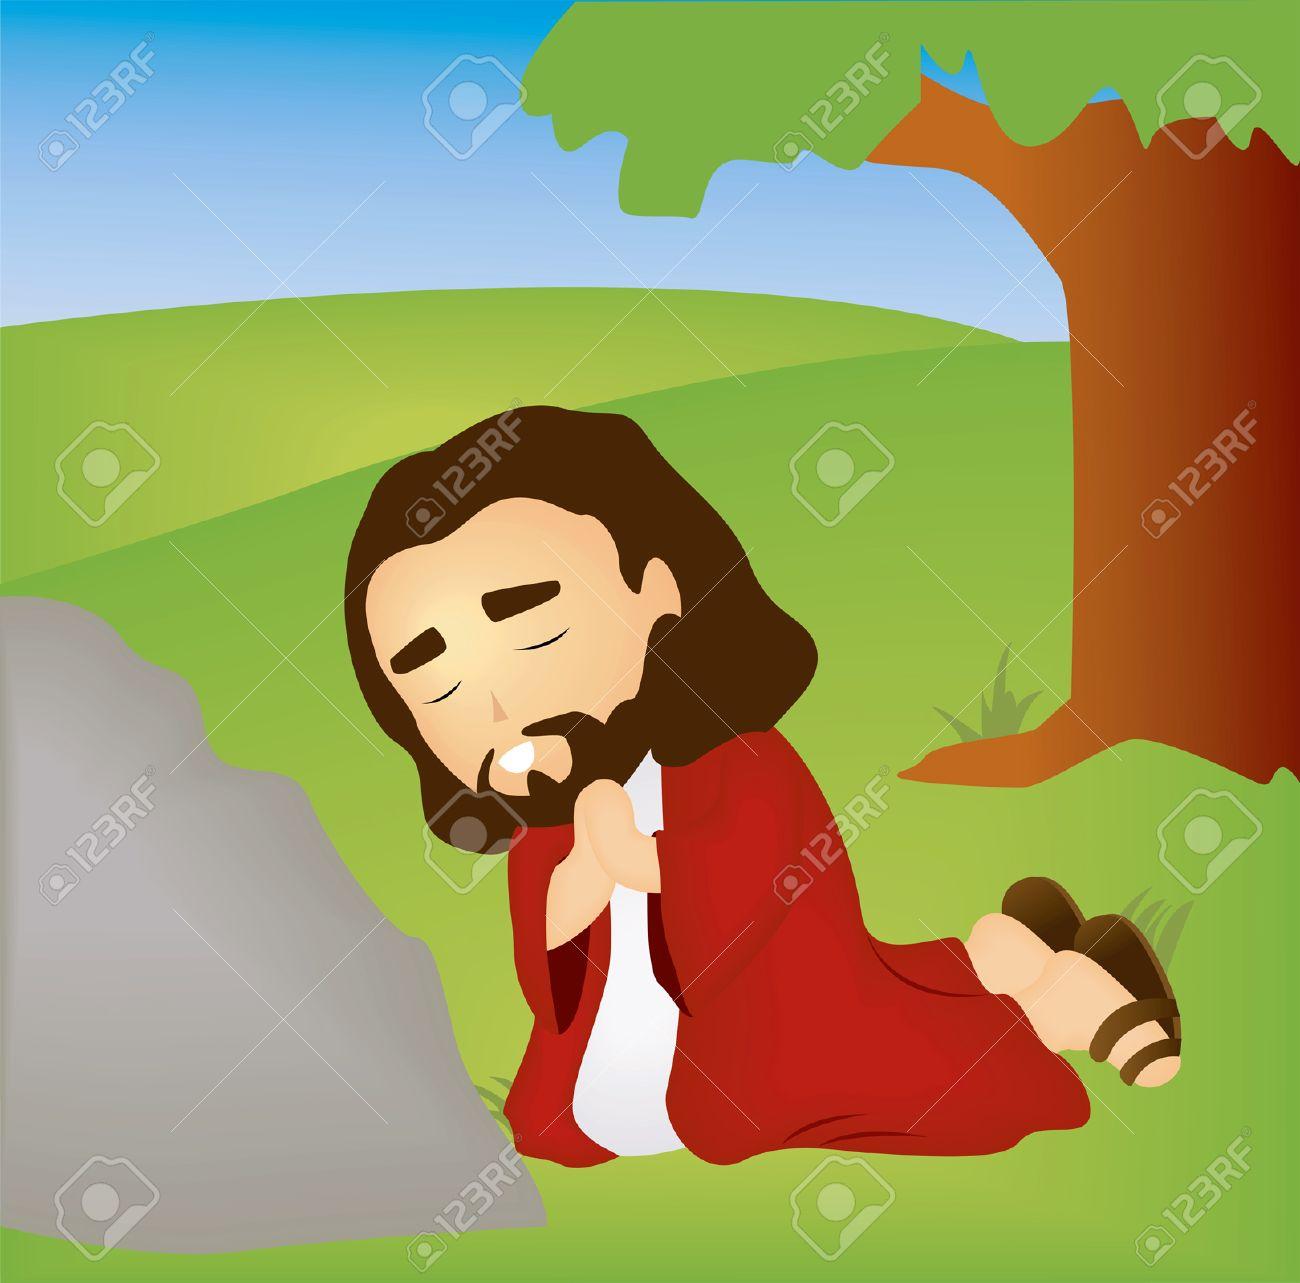 hight resolution of bible stories jesus praying in the garden stock vector 1998540